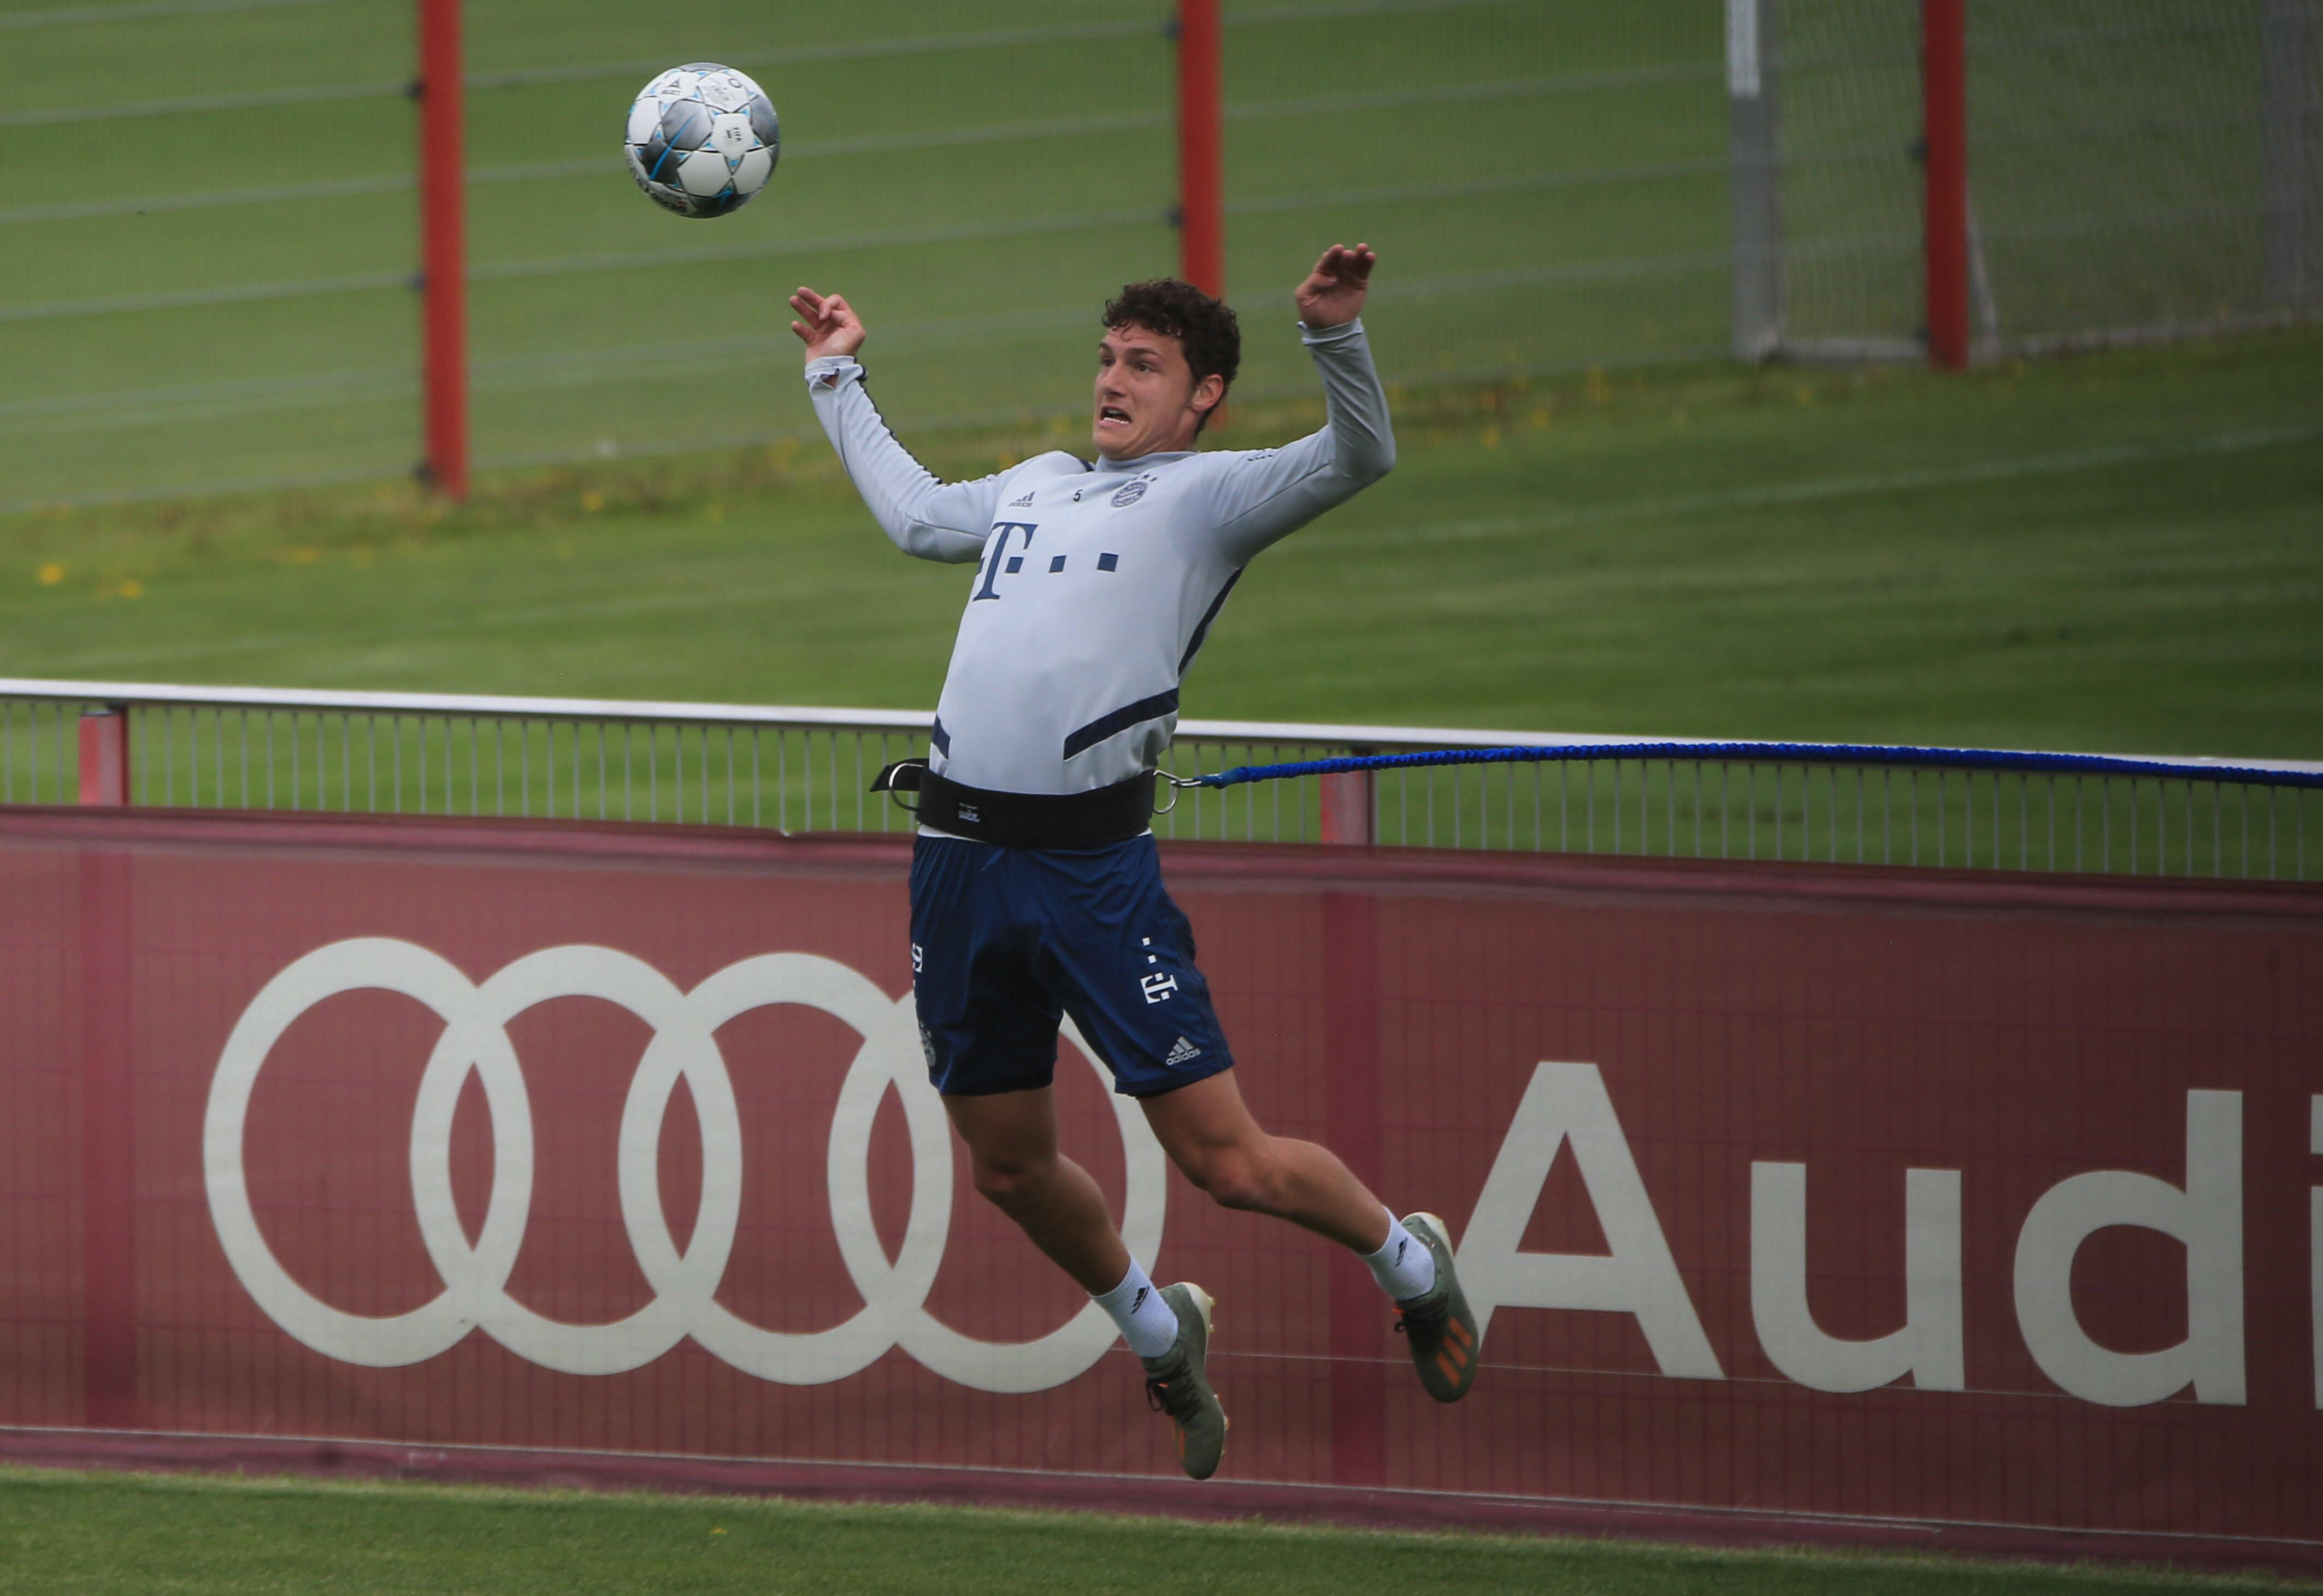 Football - Etranger - Inspiré par Mandela, Pavard a gagné sa place au Bayern